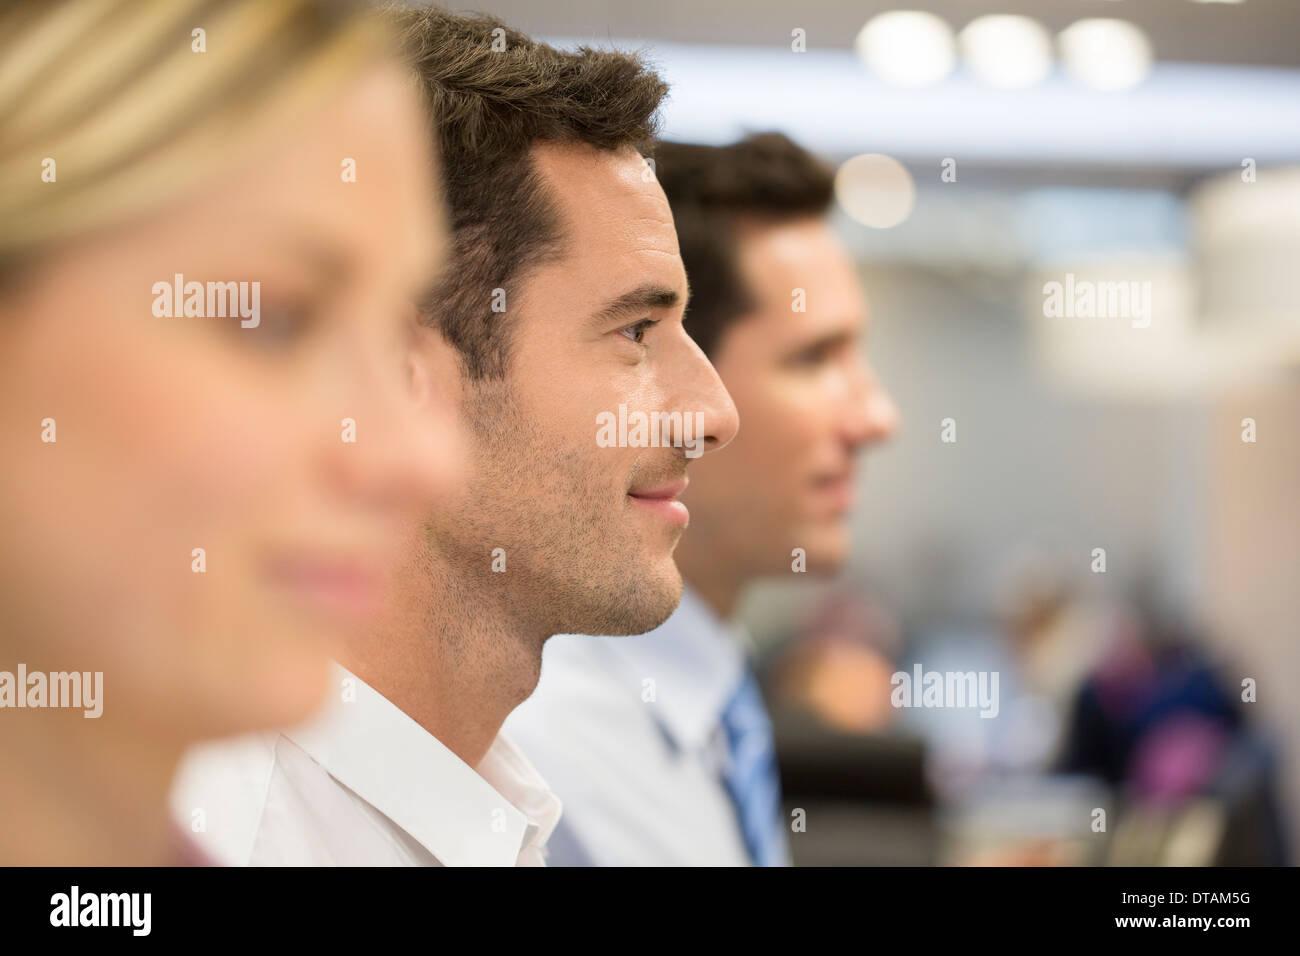 Groupe hommes femme profil office line Banque D'Images